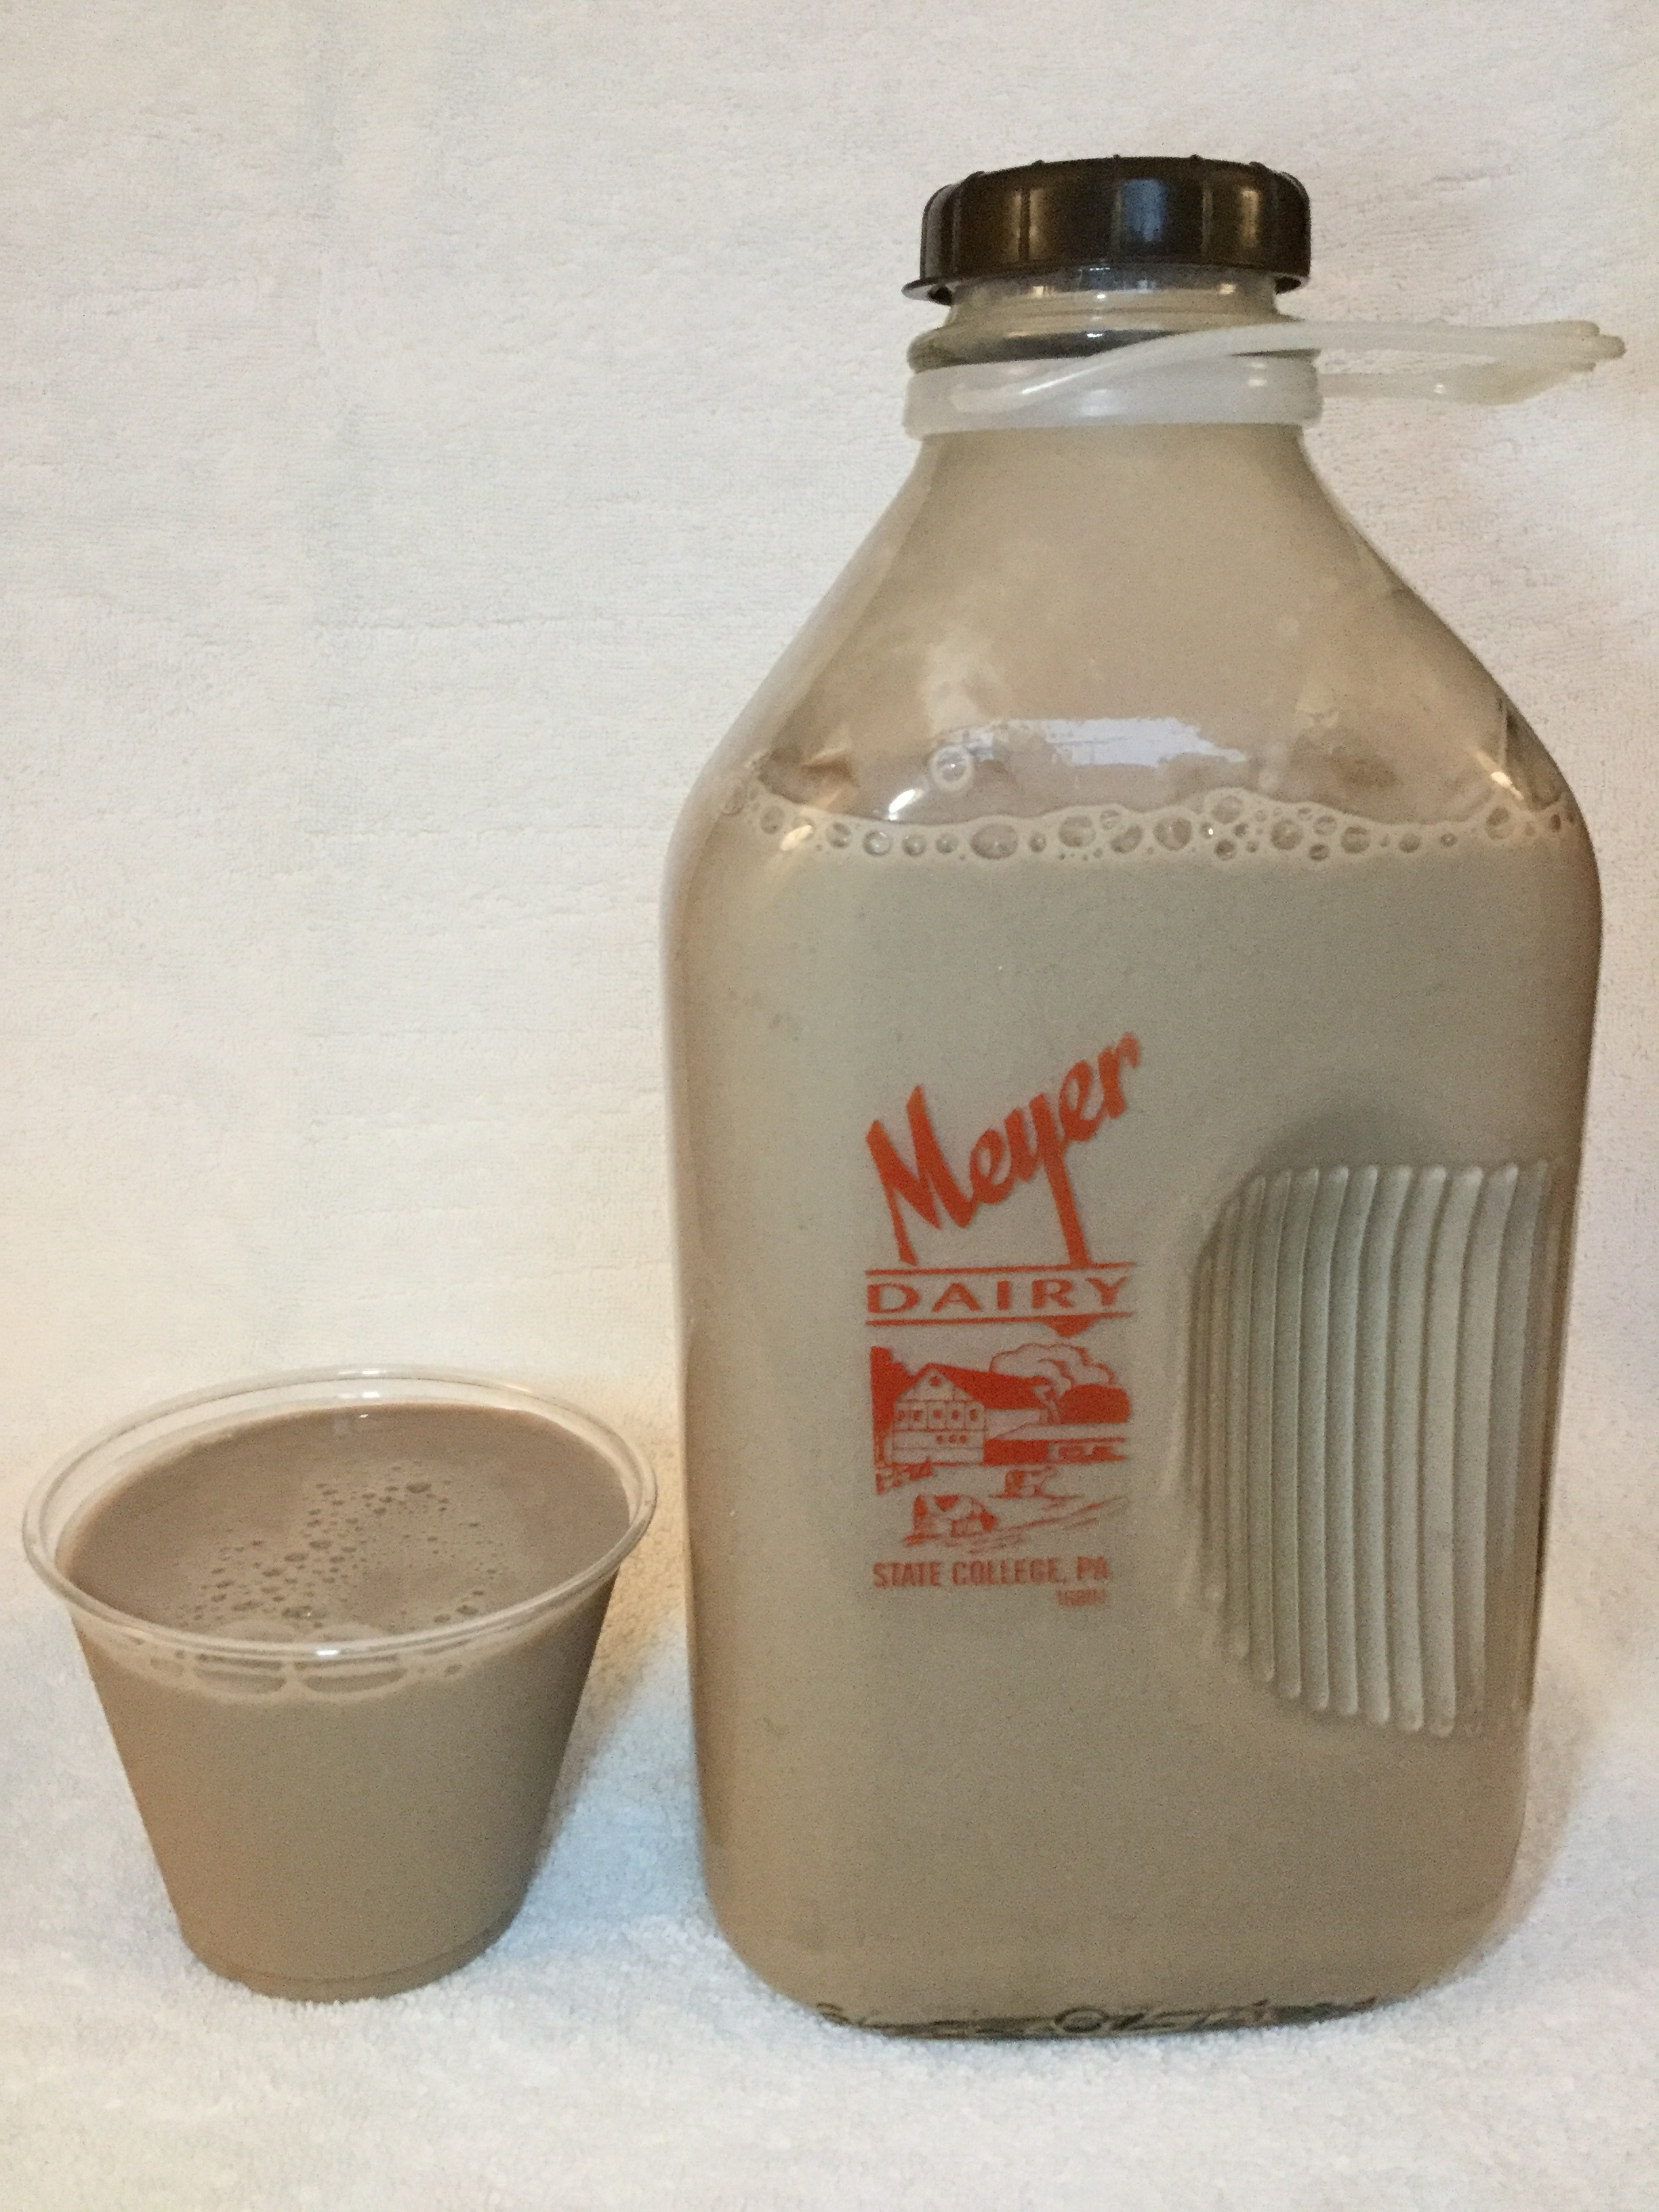 Meyer Dairy Chocolate Milk Cup